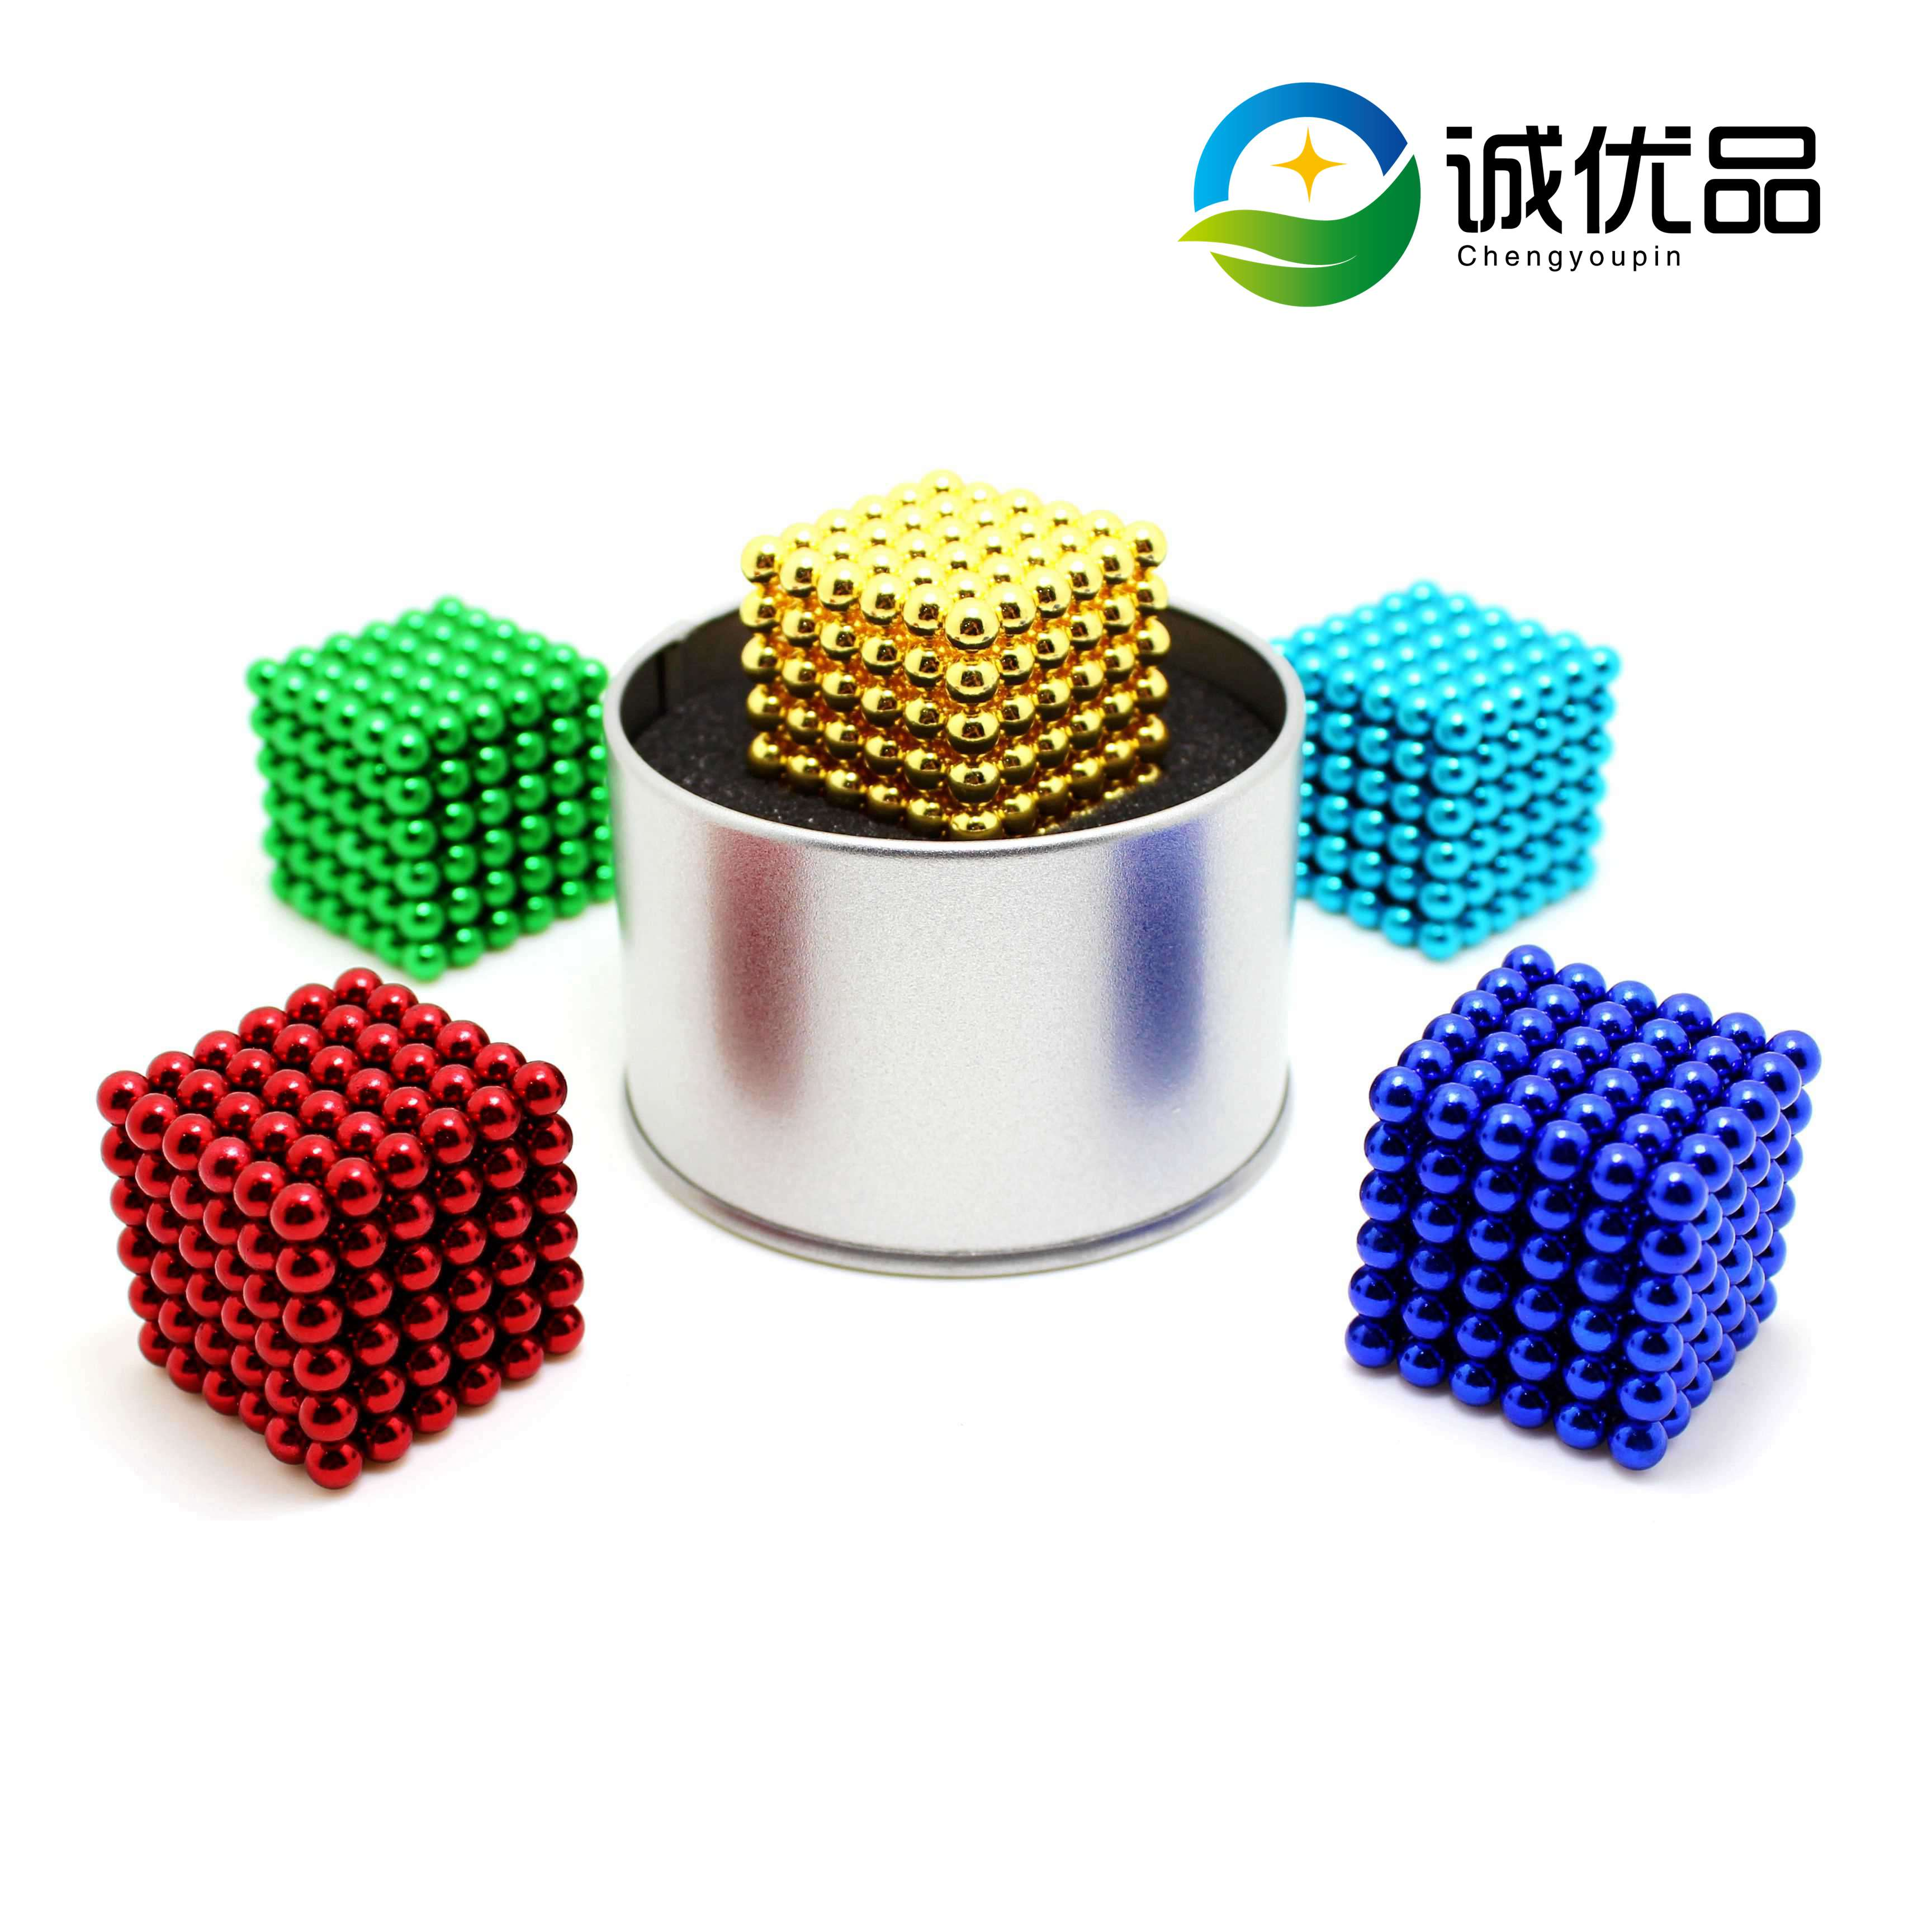 5mm Magnetic Cube Neo Cube Magic Cube Blocks Magnets Puzzle 216pcs 512pcs 1000pcs Balling For Choice(China)